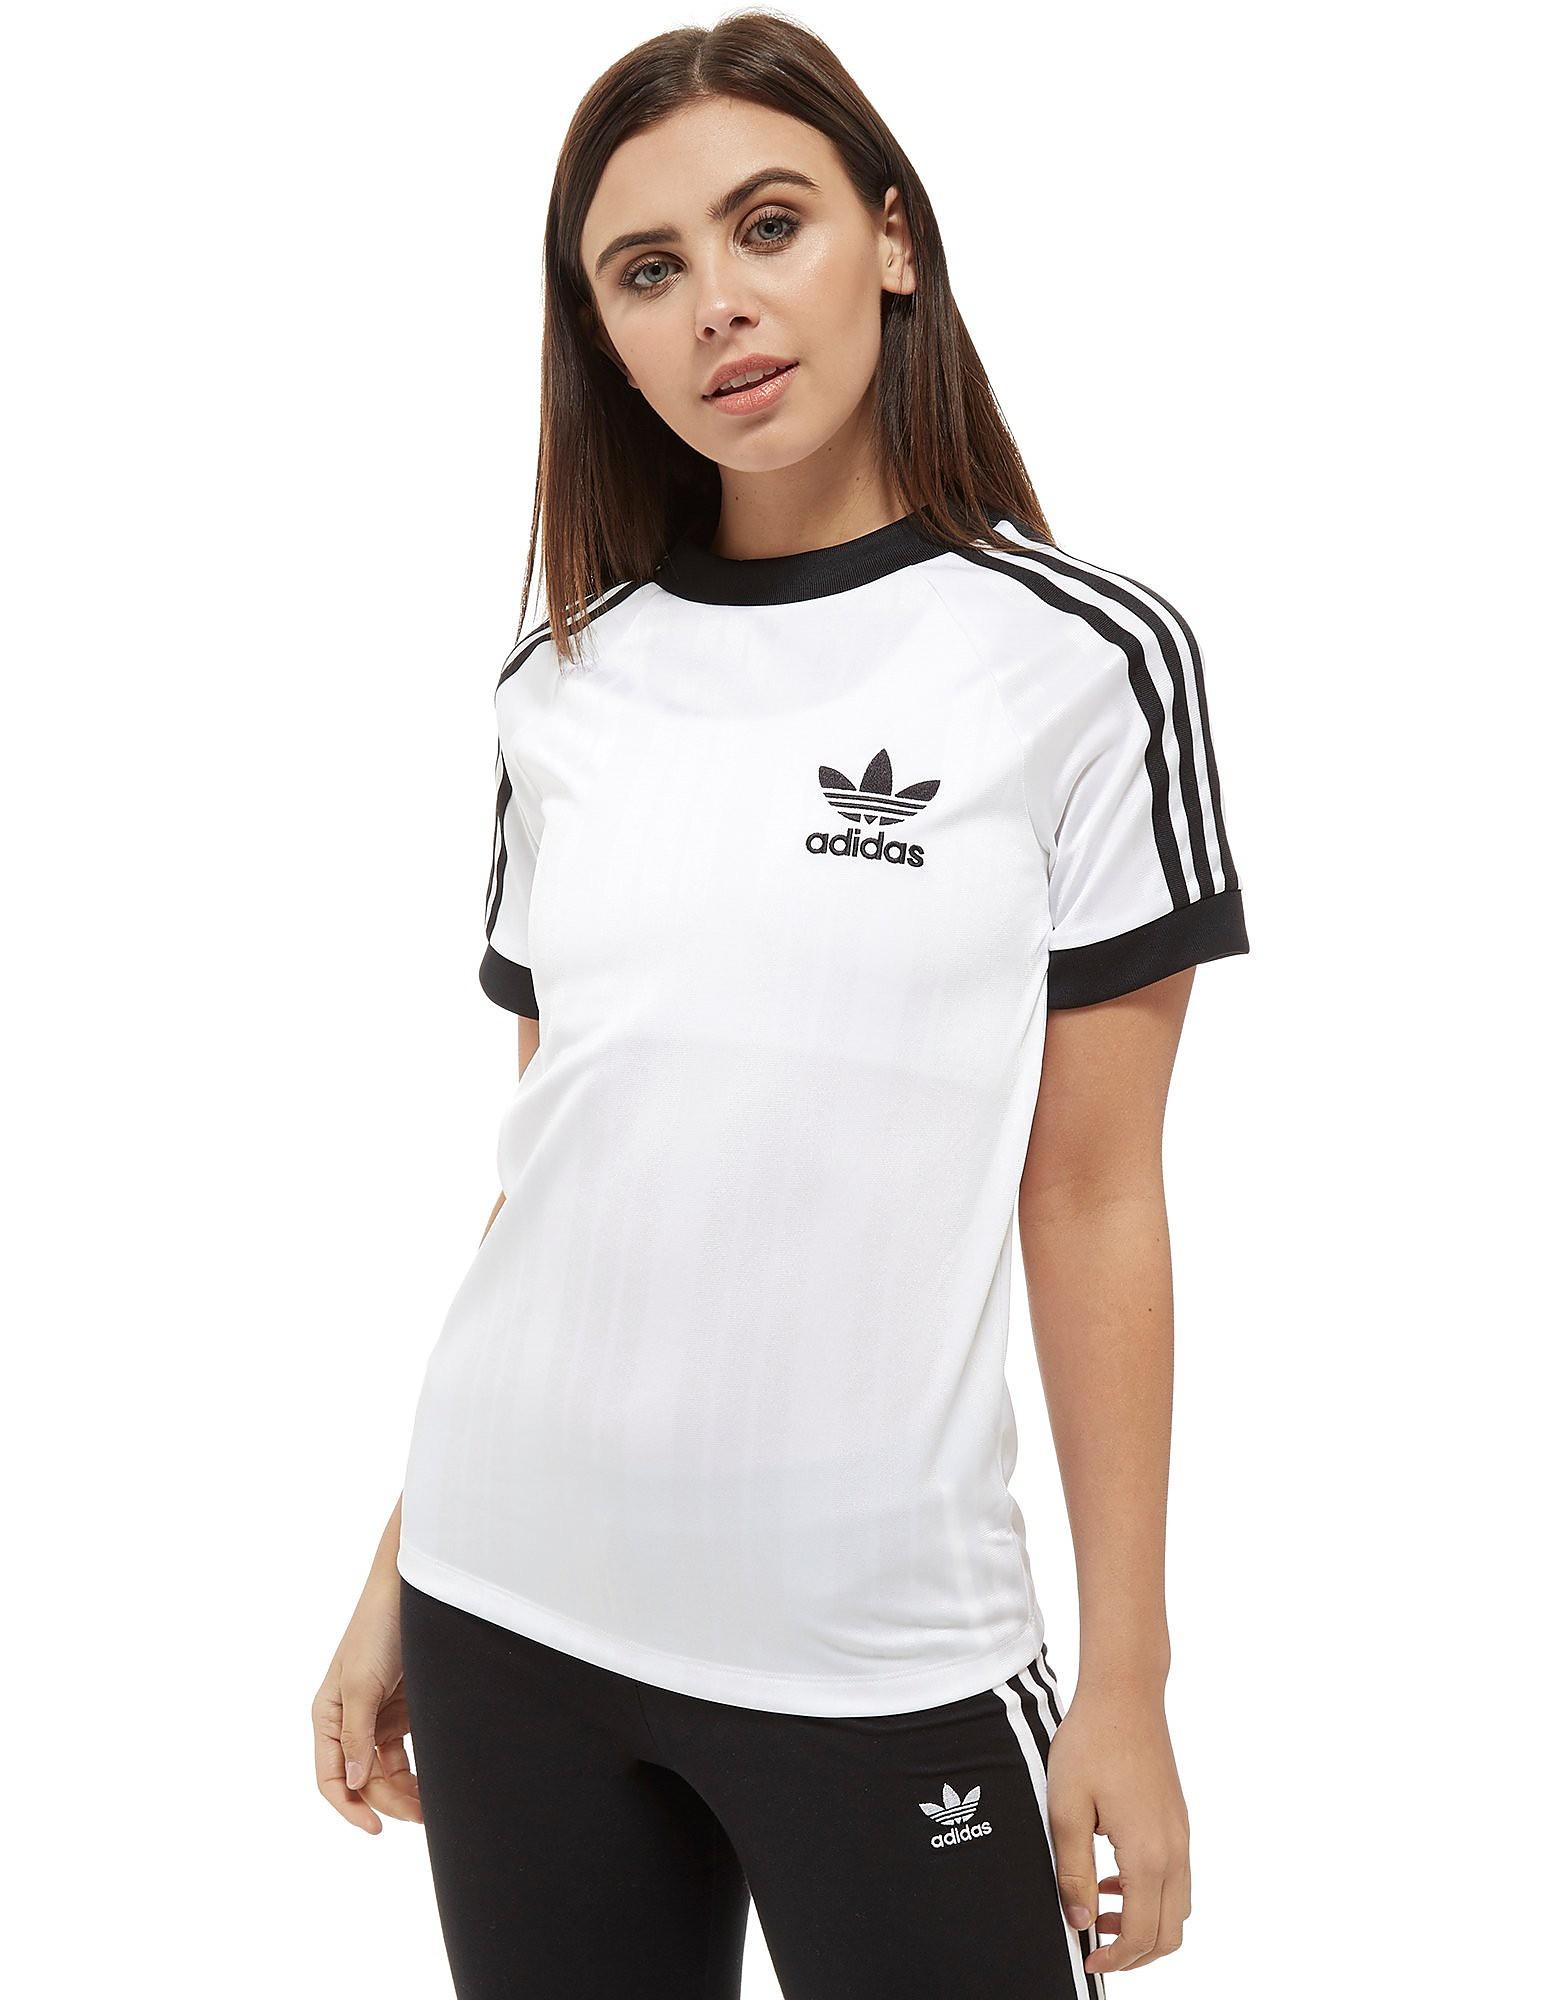 adidas Originals California Football T-Shirt Femme